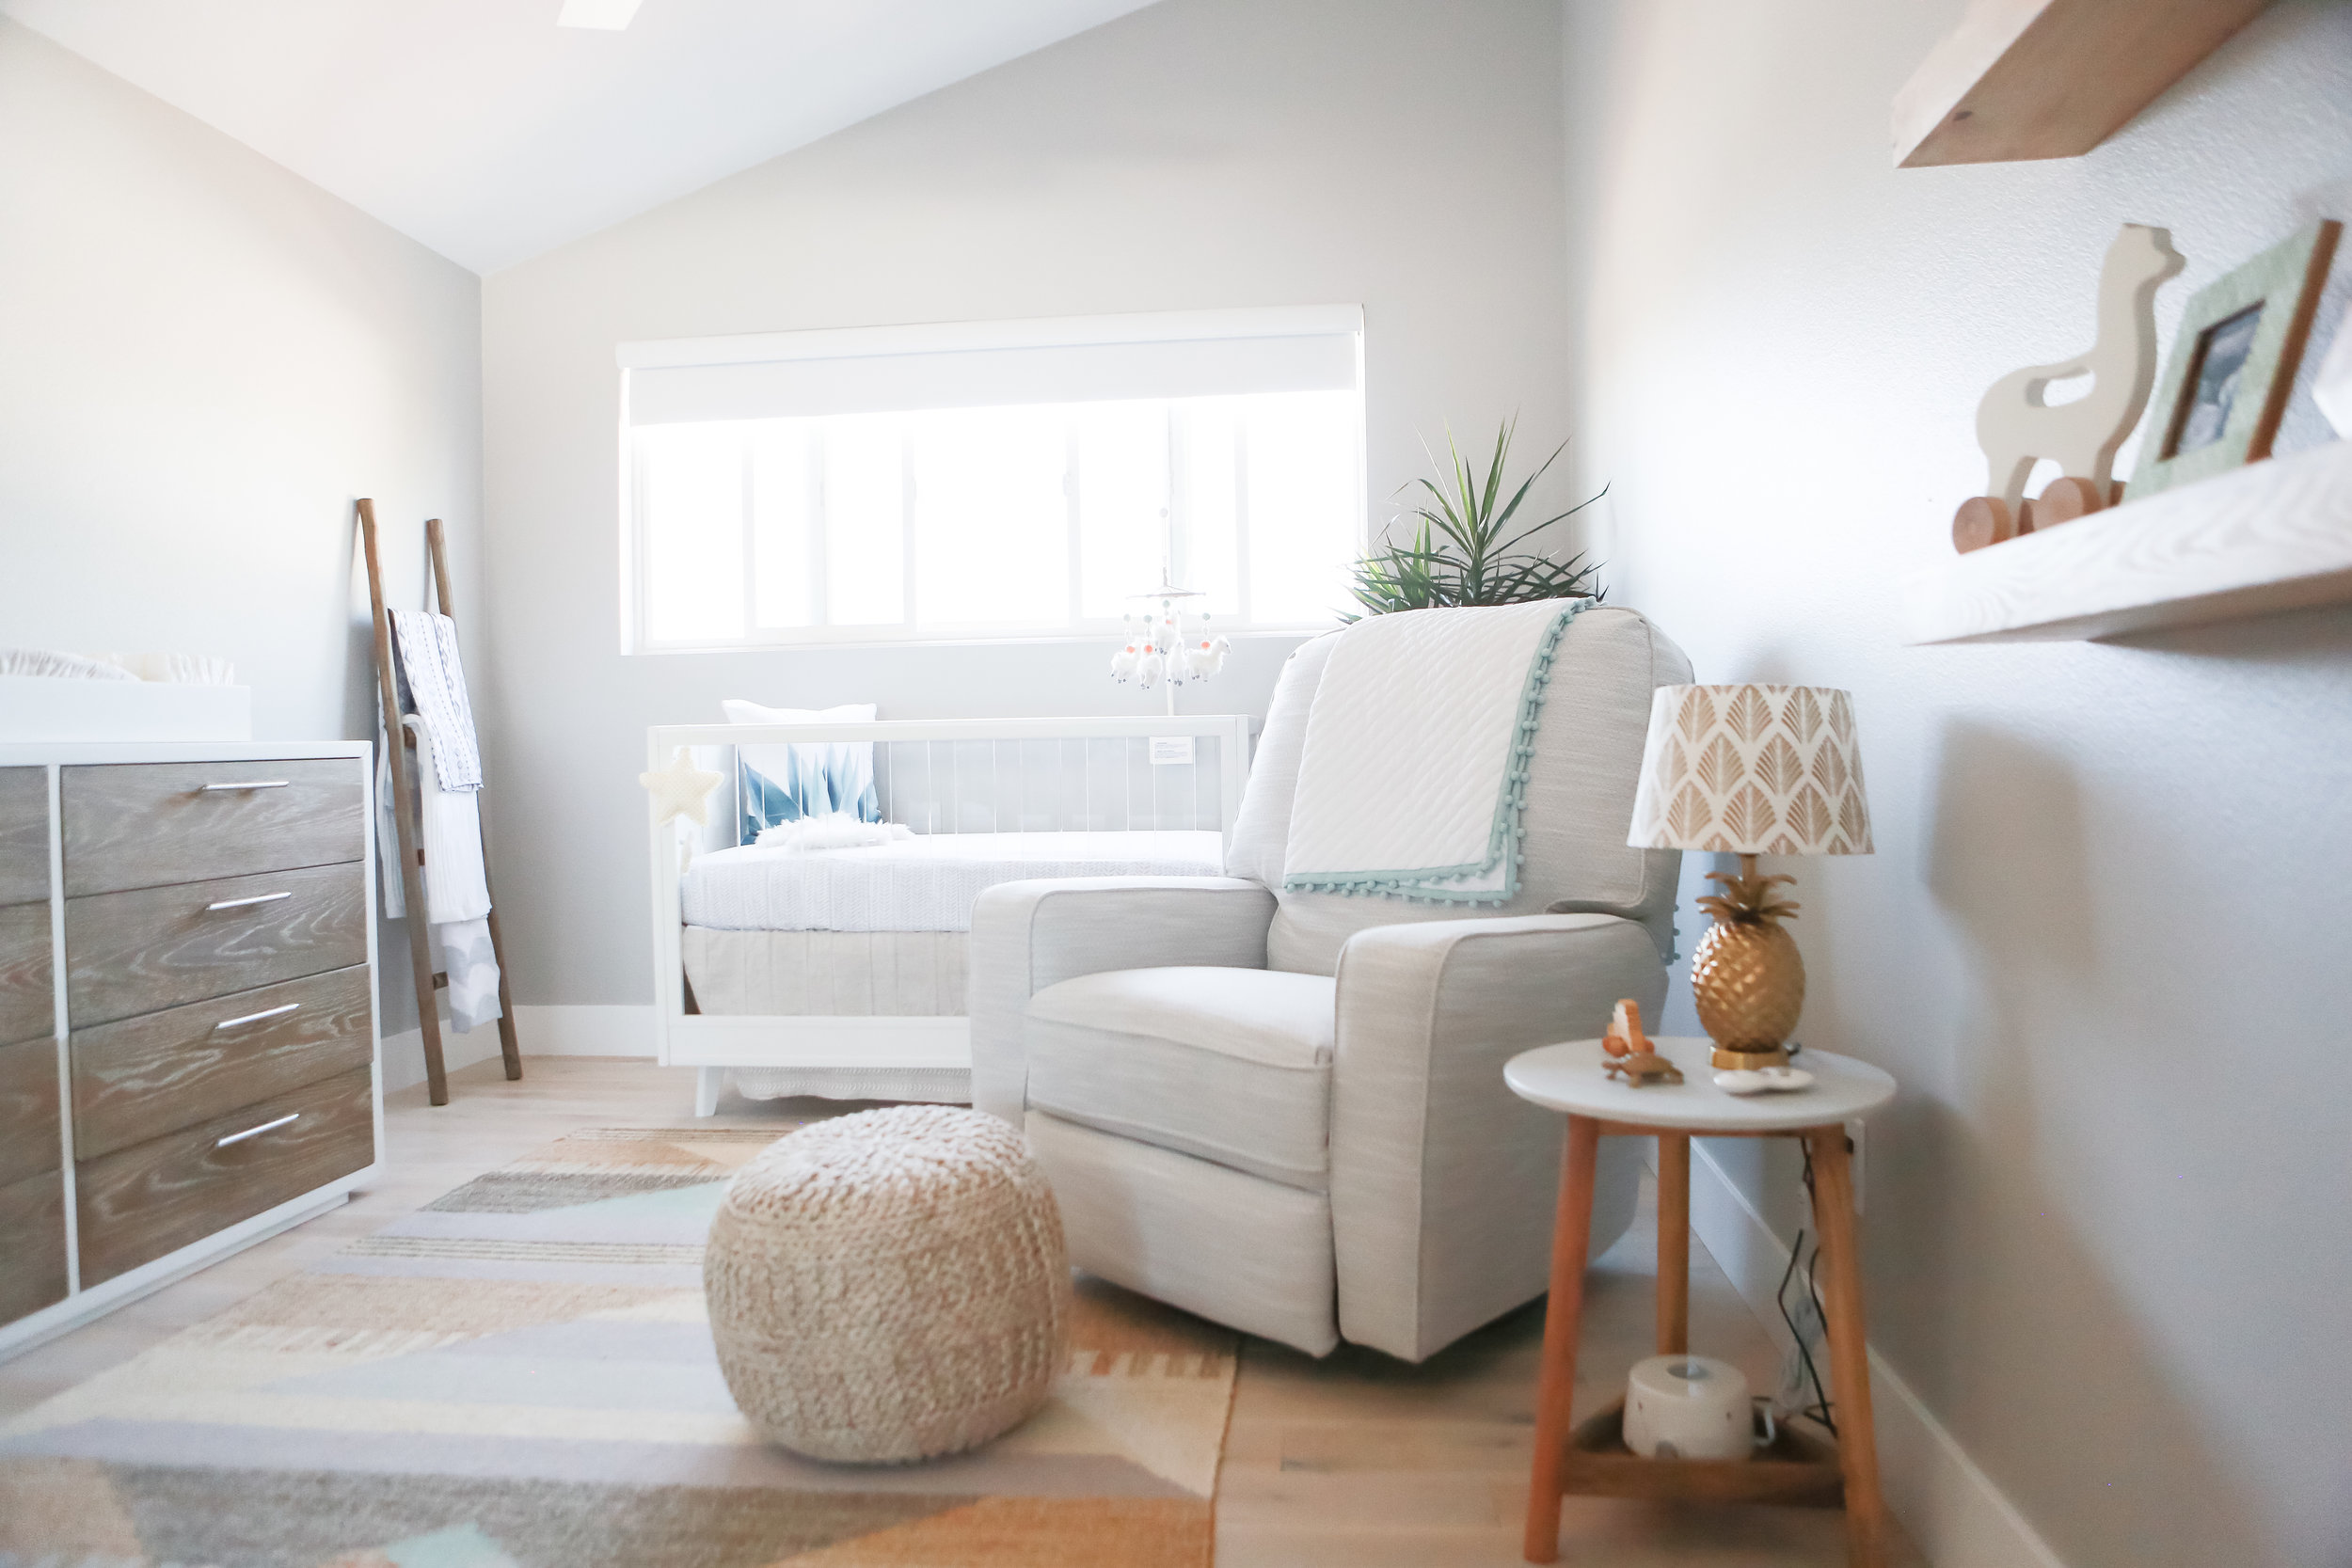 Boo & Rook gender neutral nursery interior design edesign boston  massachusetts  california beach vibe.jpg